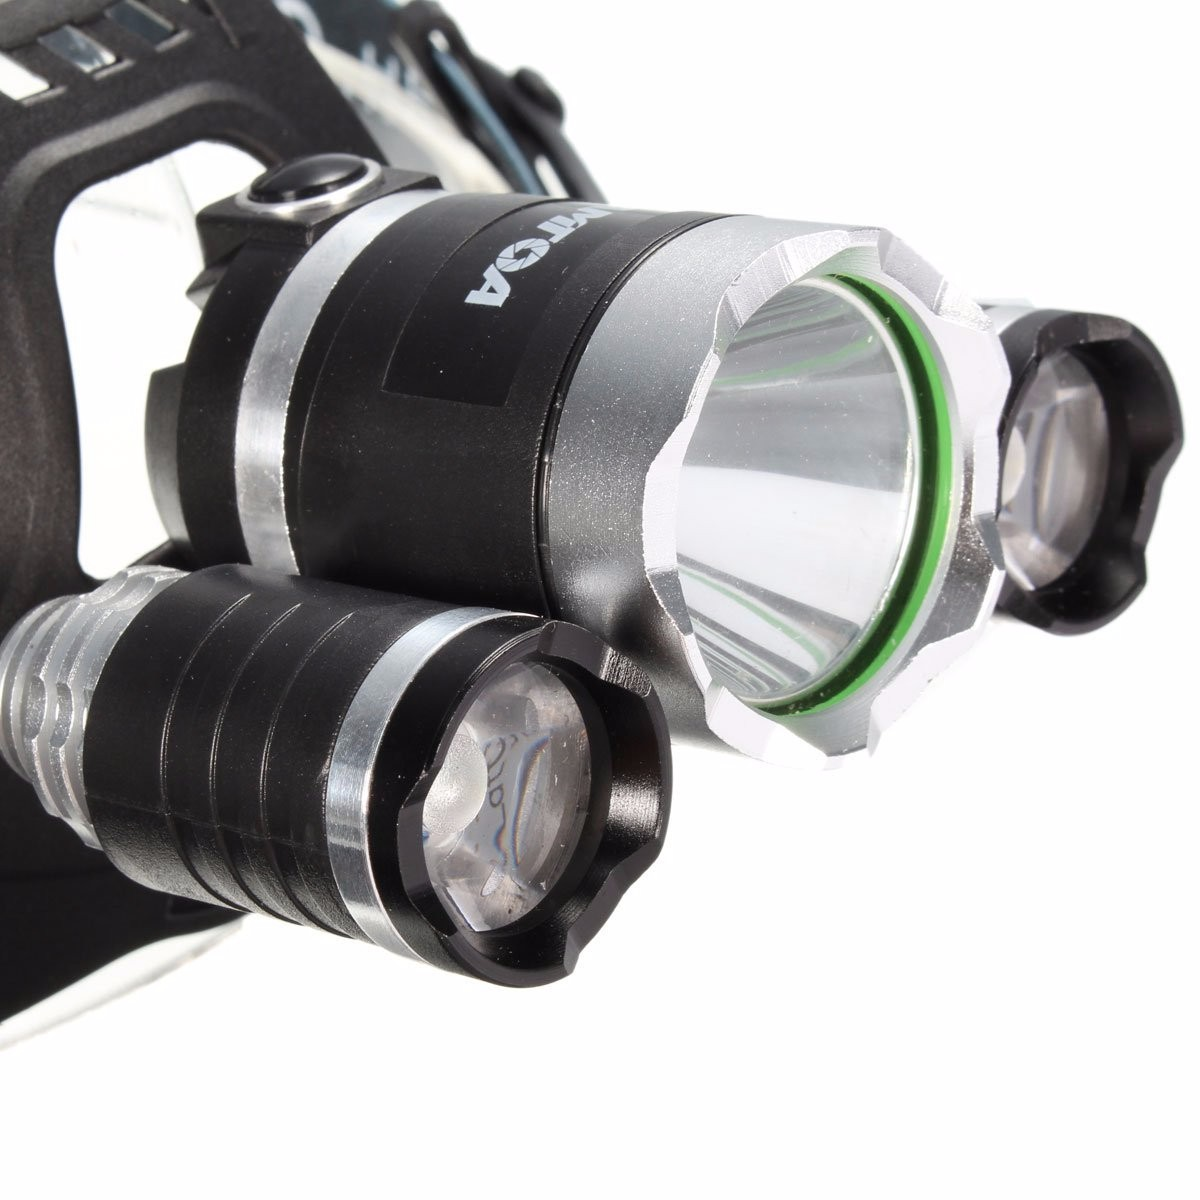 6000Lm T6 3xLED Headlight Torch Headlamp Head Light Lamp Rechargeable CA